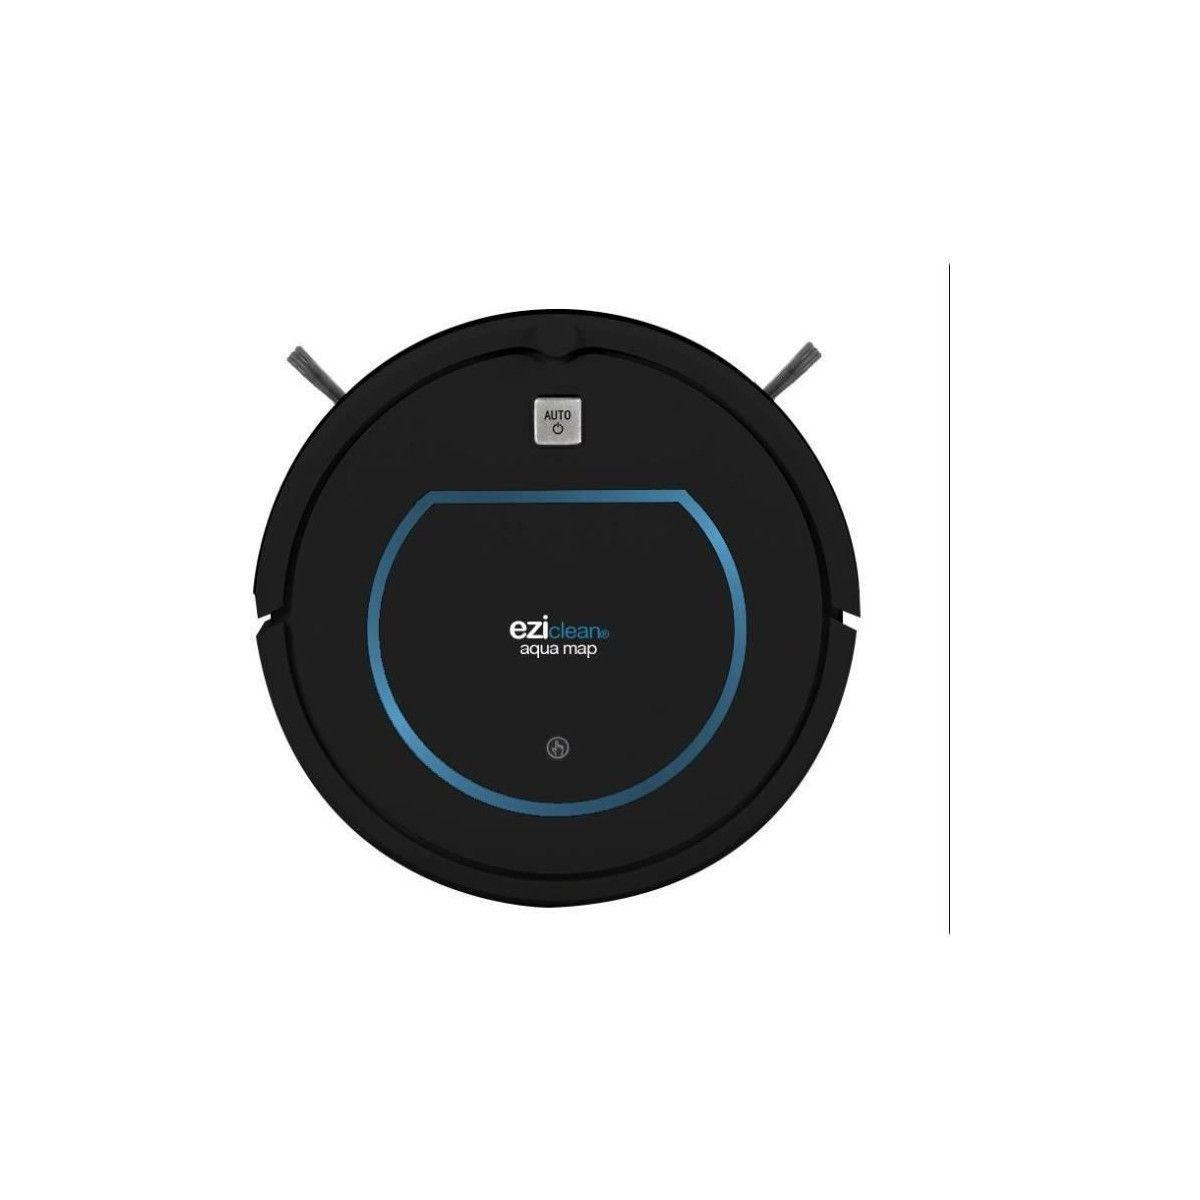 Aspirateur robot laveur EZIclean One Aqua 210 60 dB, 120